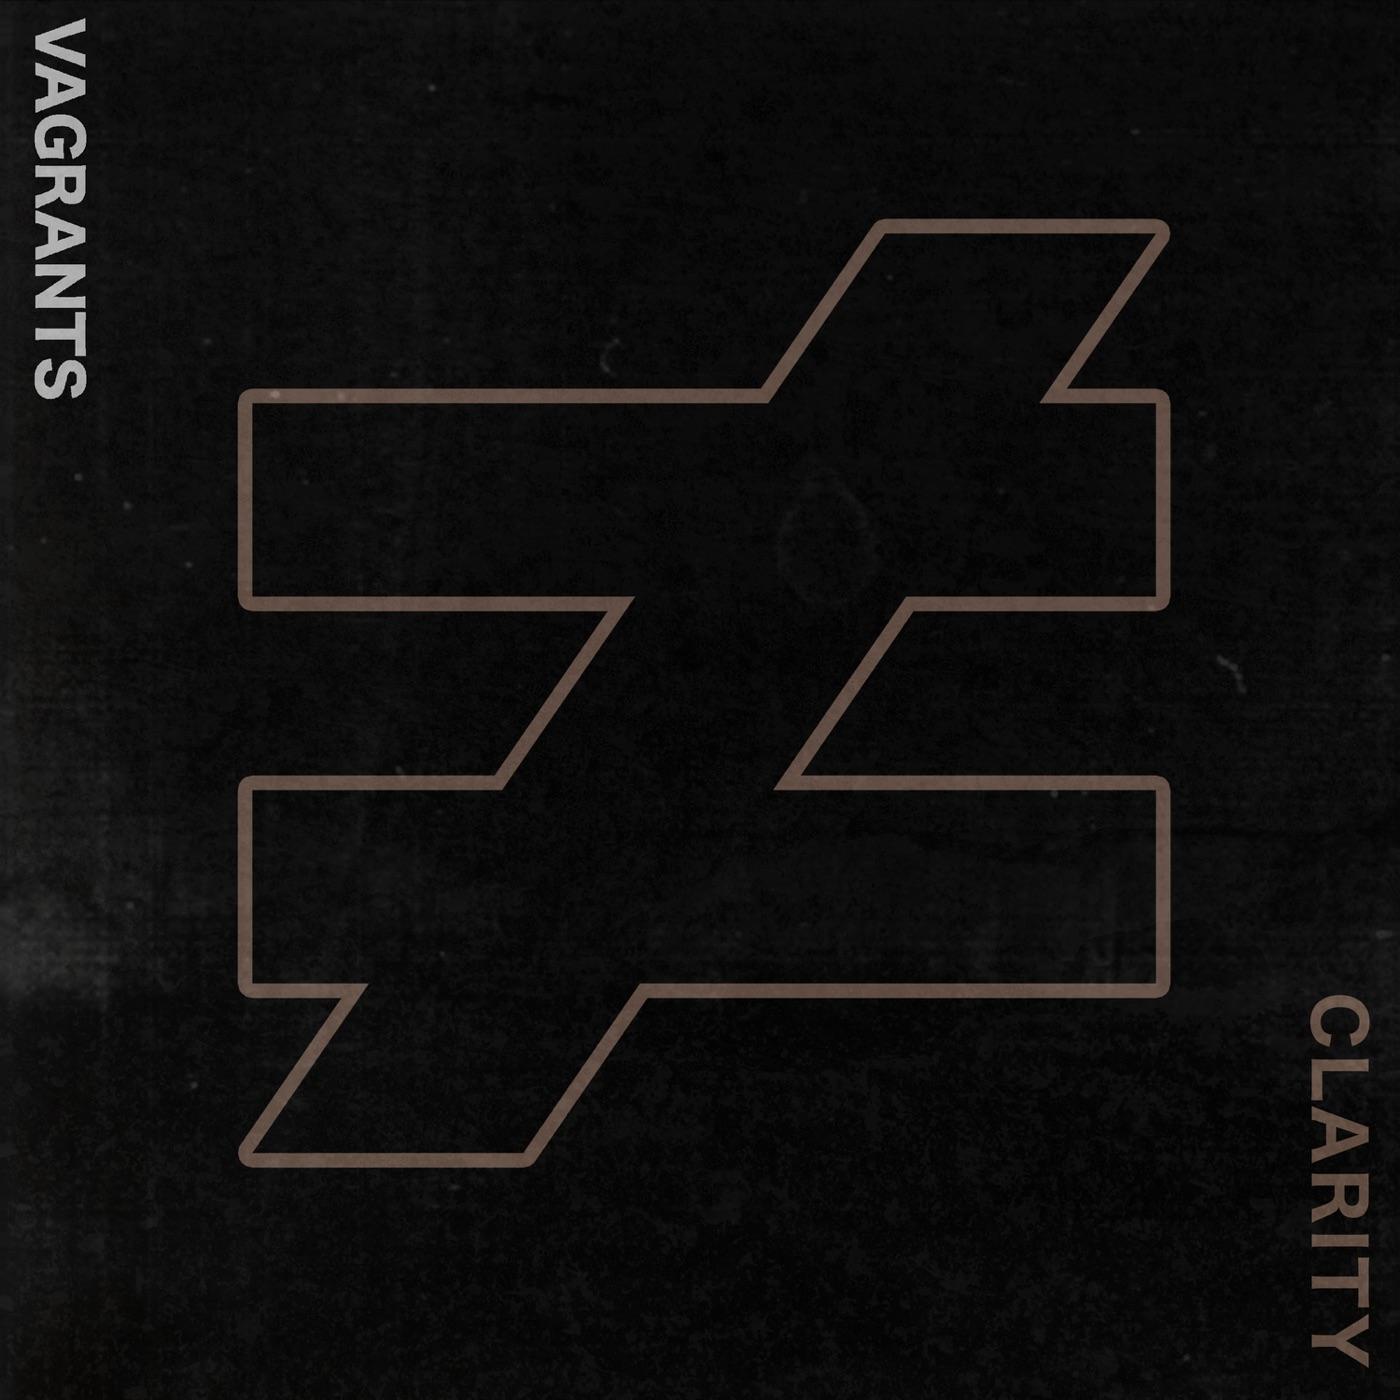 Vagrants - Clarity [Single] (2018)